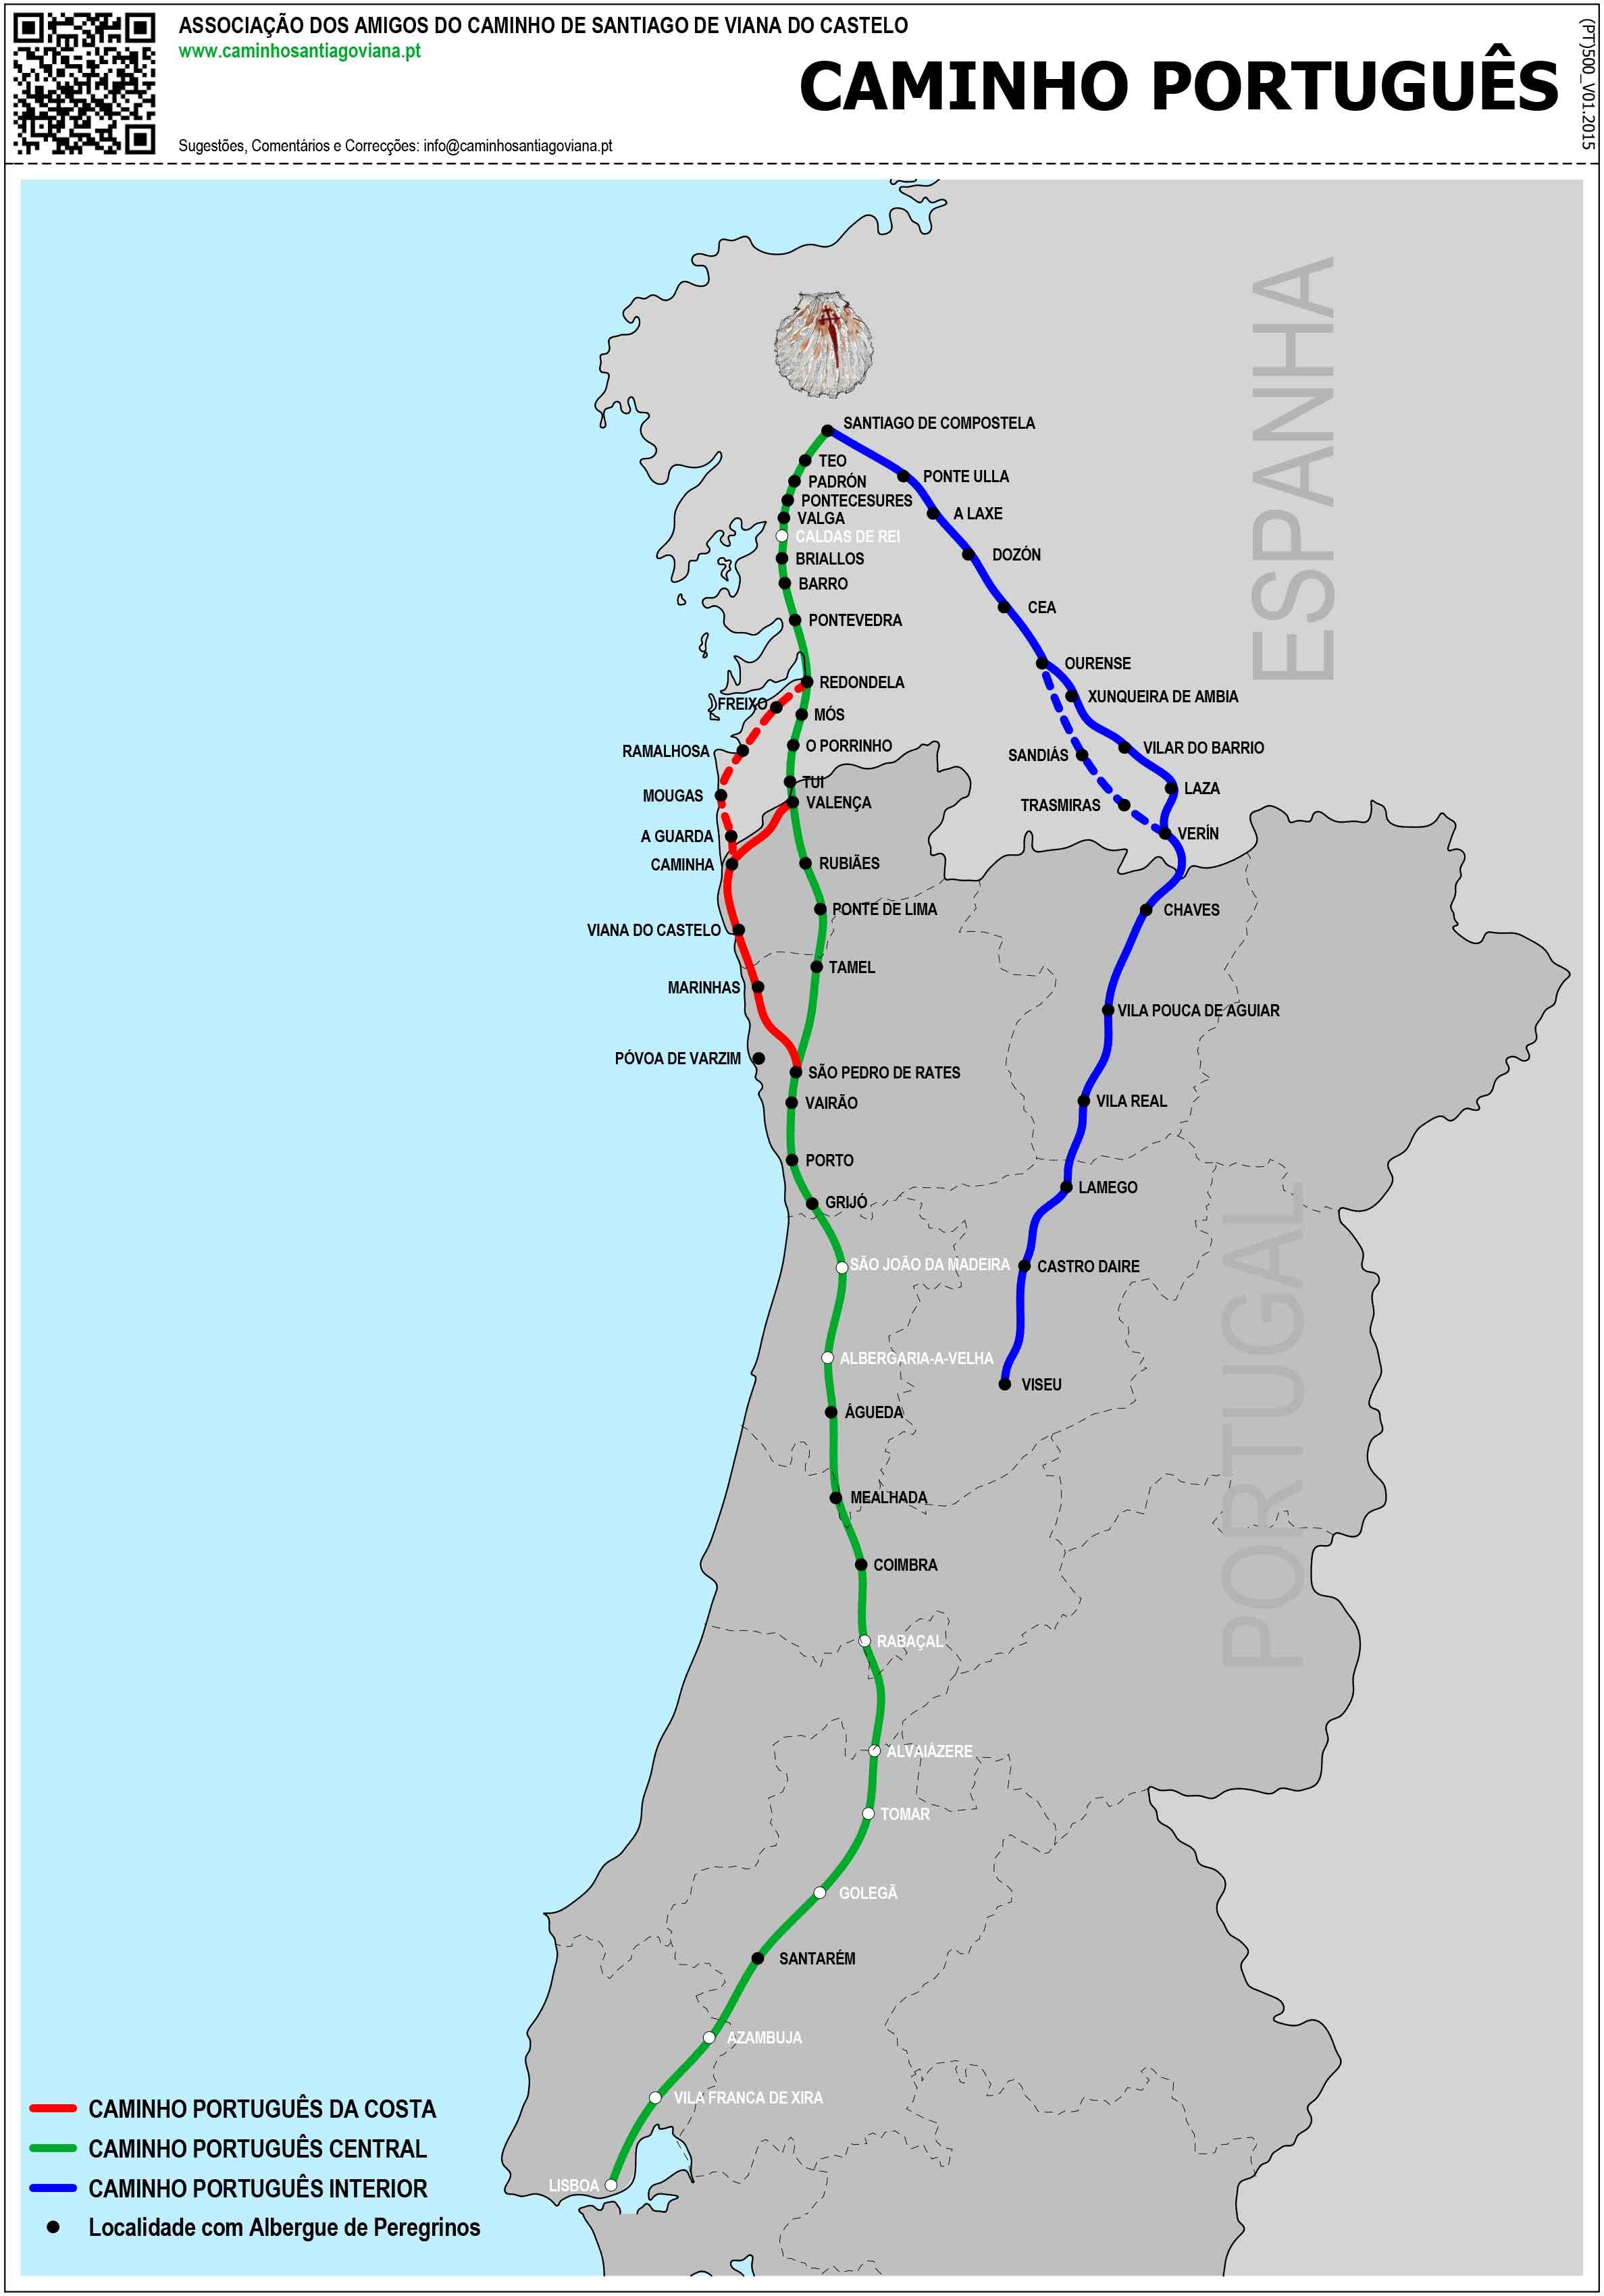 Caminhos Portugueses de Santiago